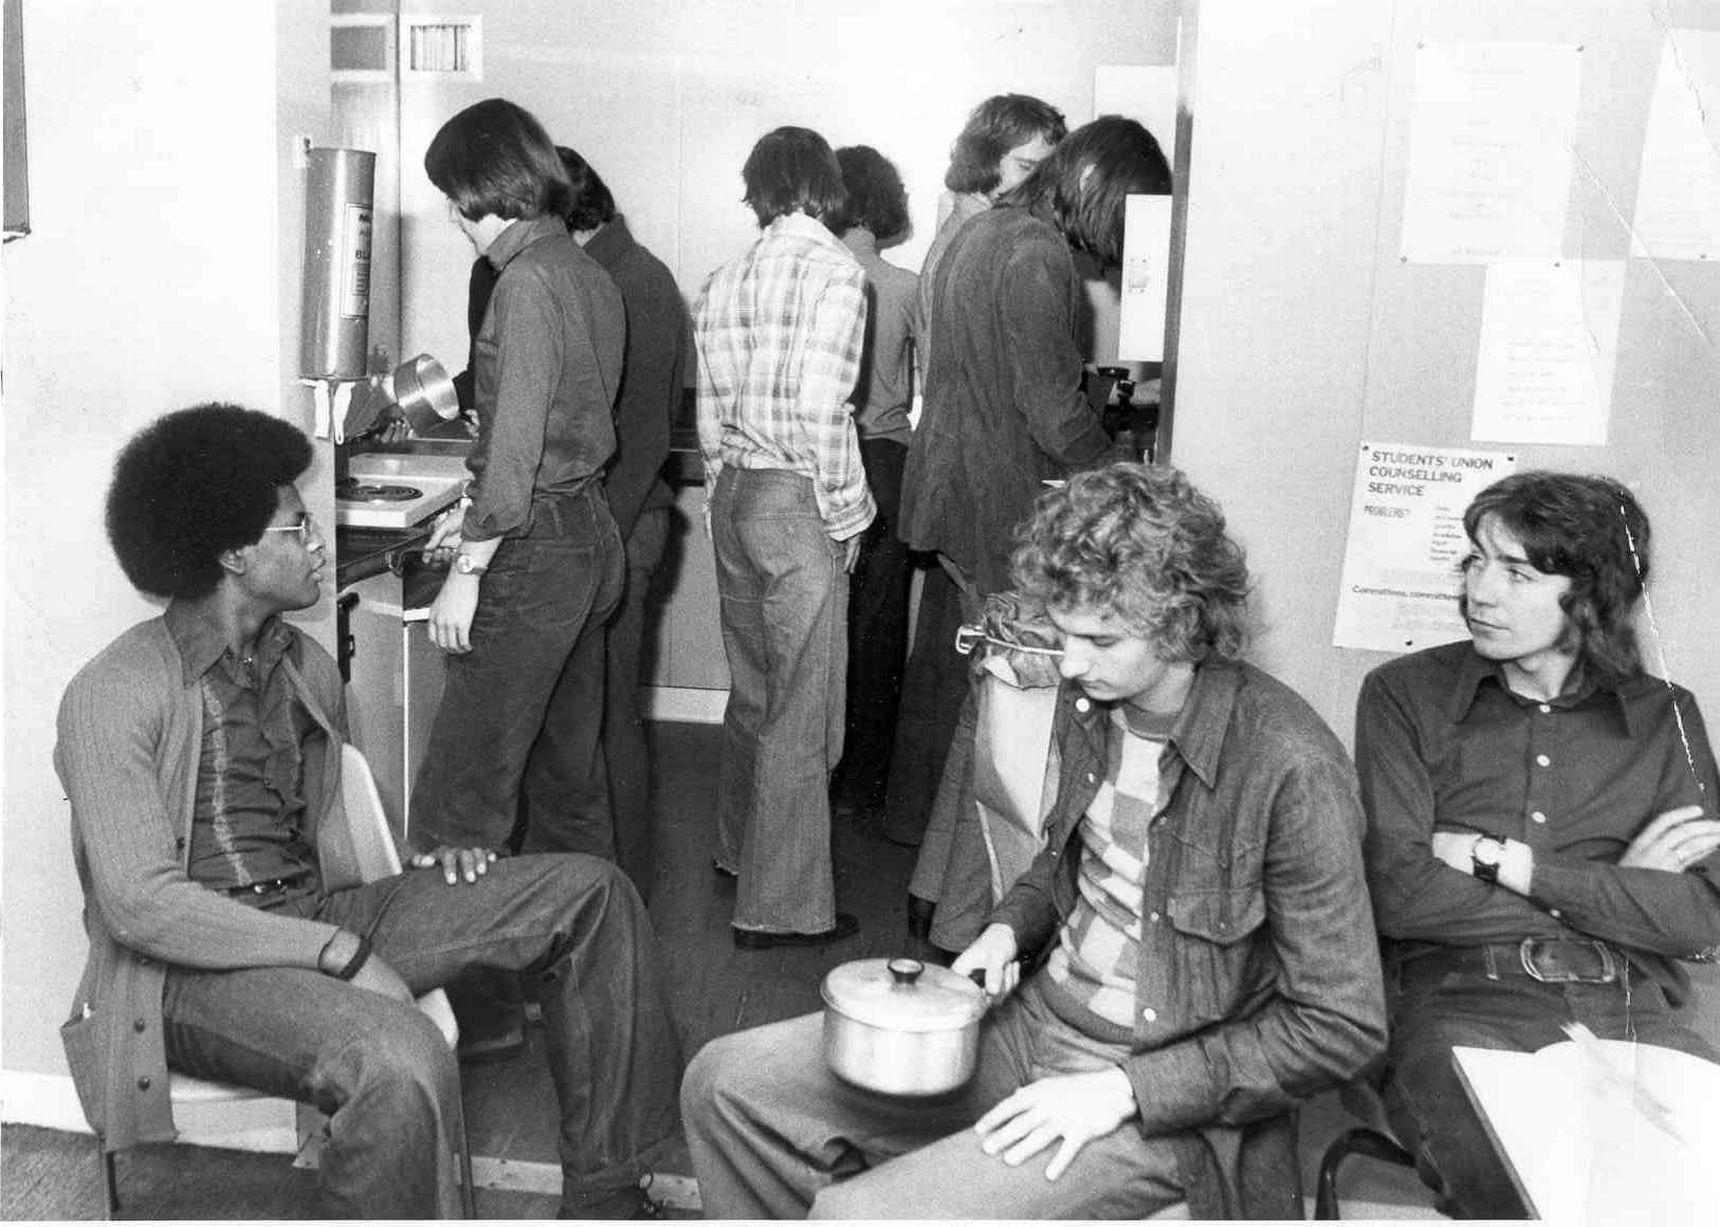 Kitchen queue (1970s)